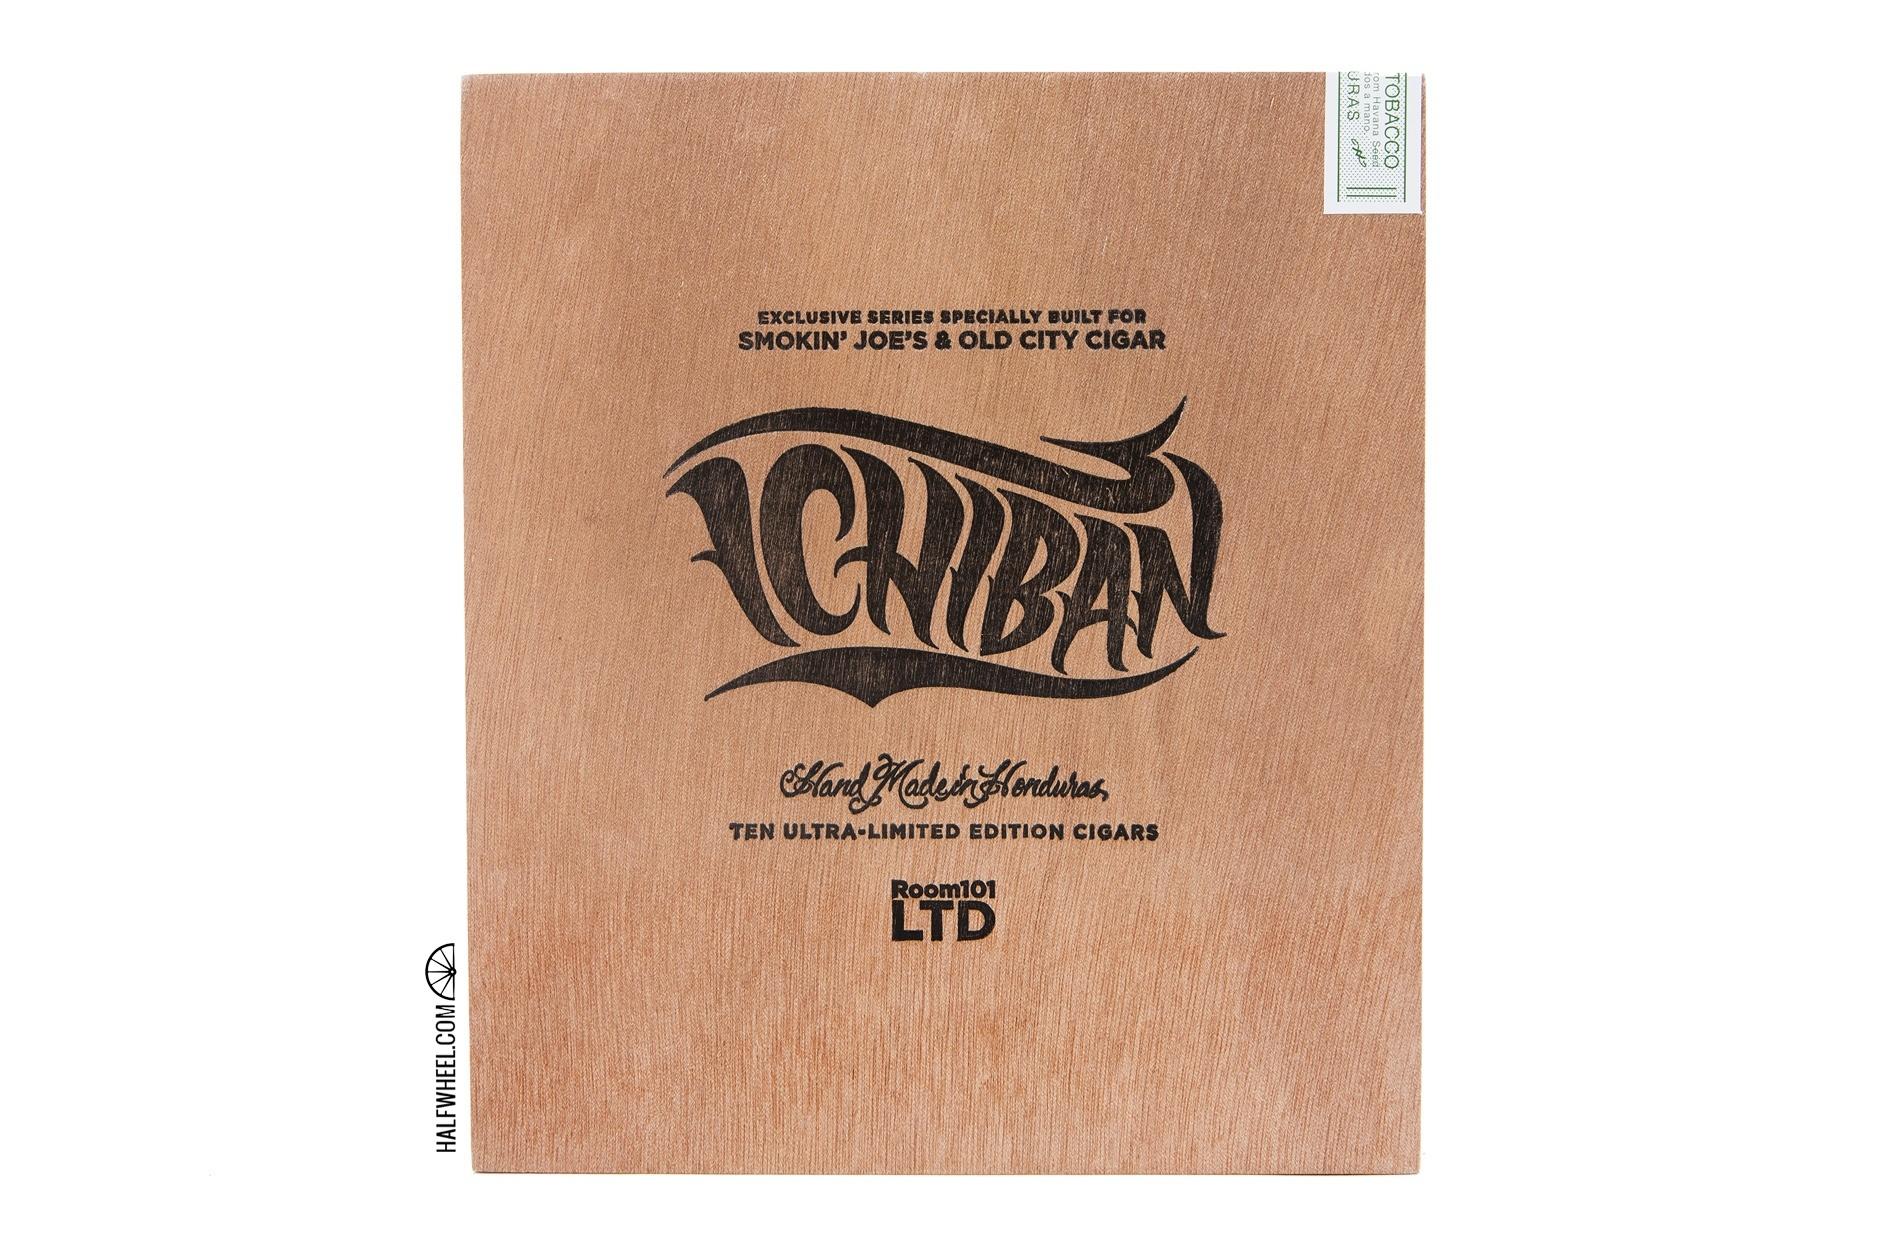 Room101 Ichiban Tiburon Box 2